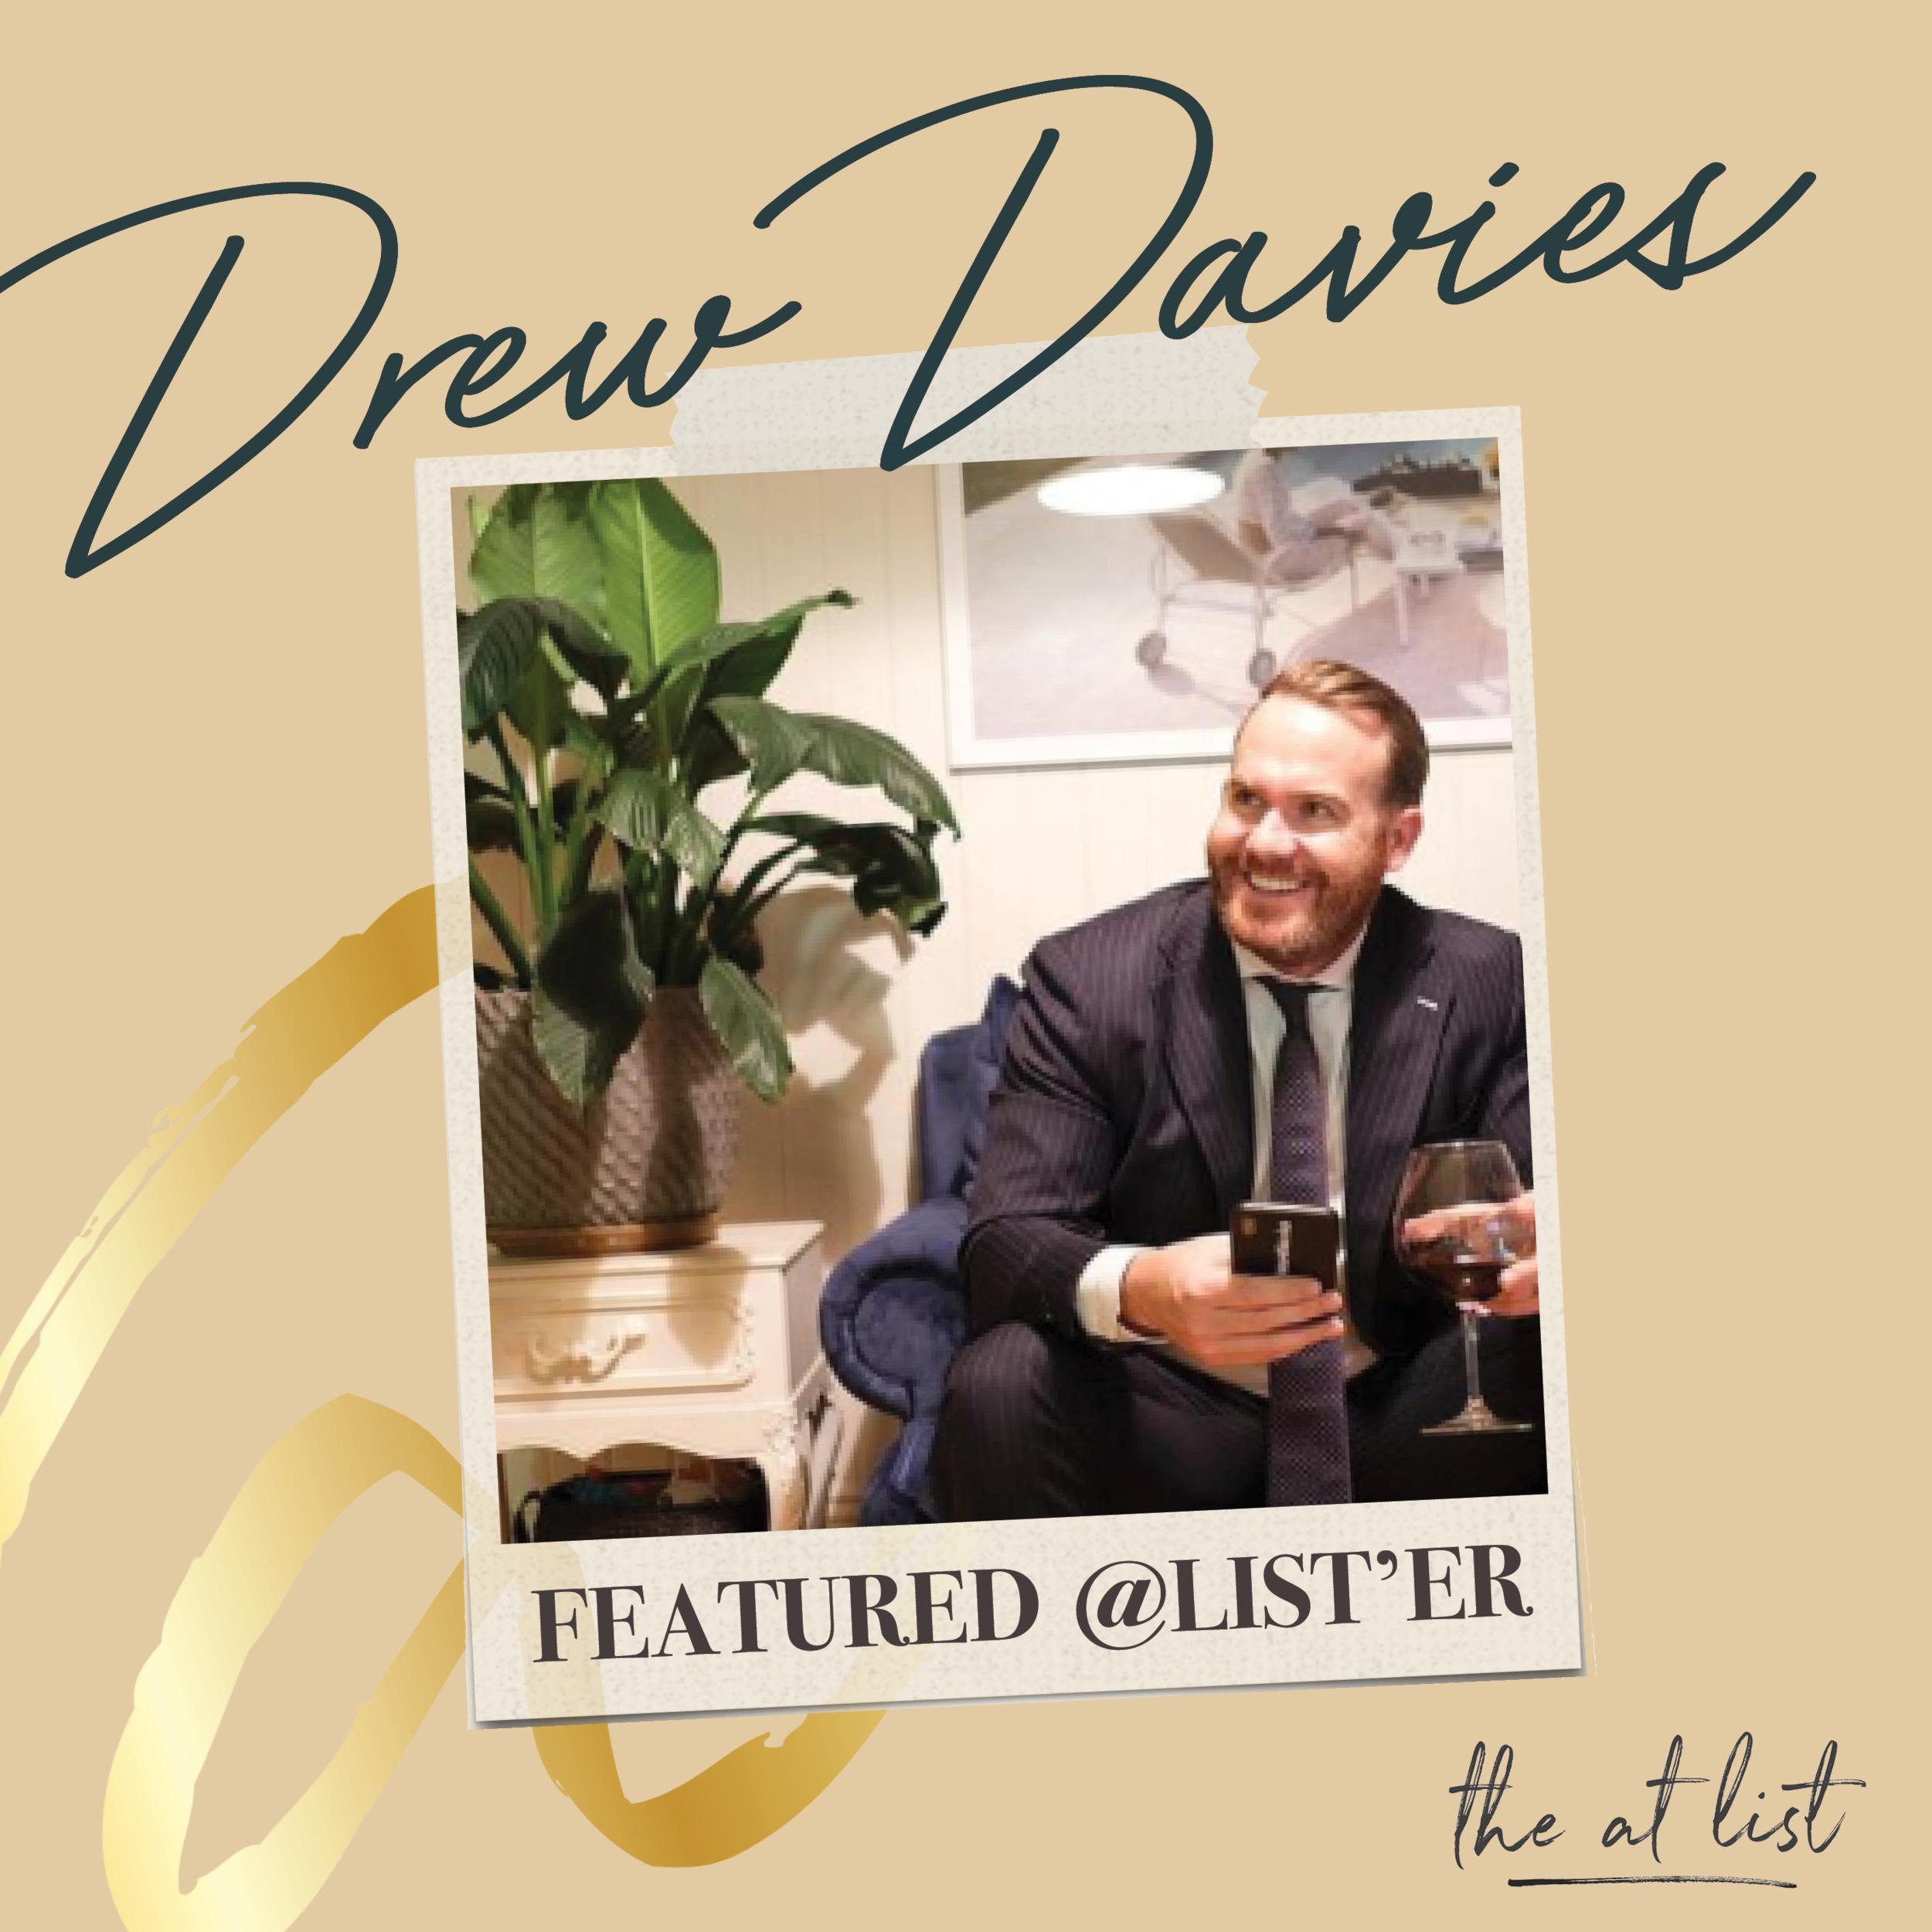 Drew Davies_Graphic_Image.png